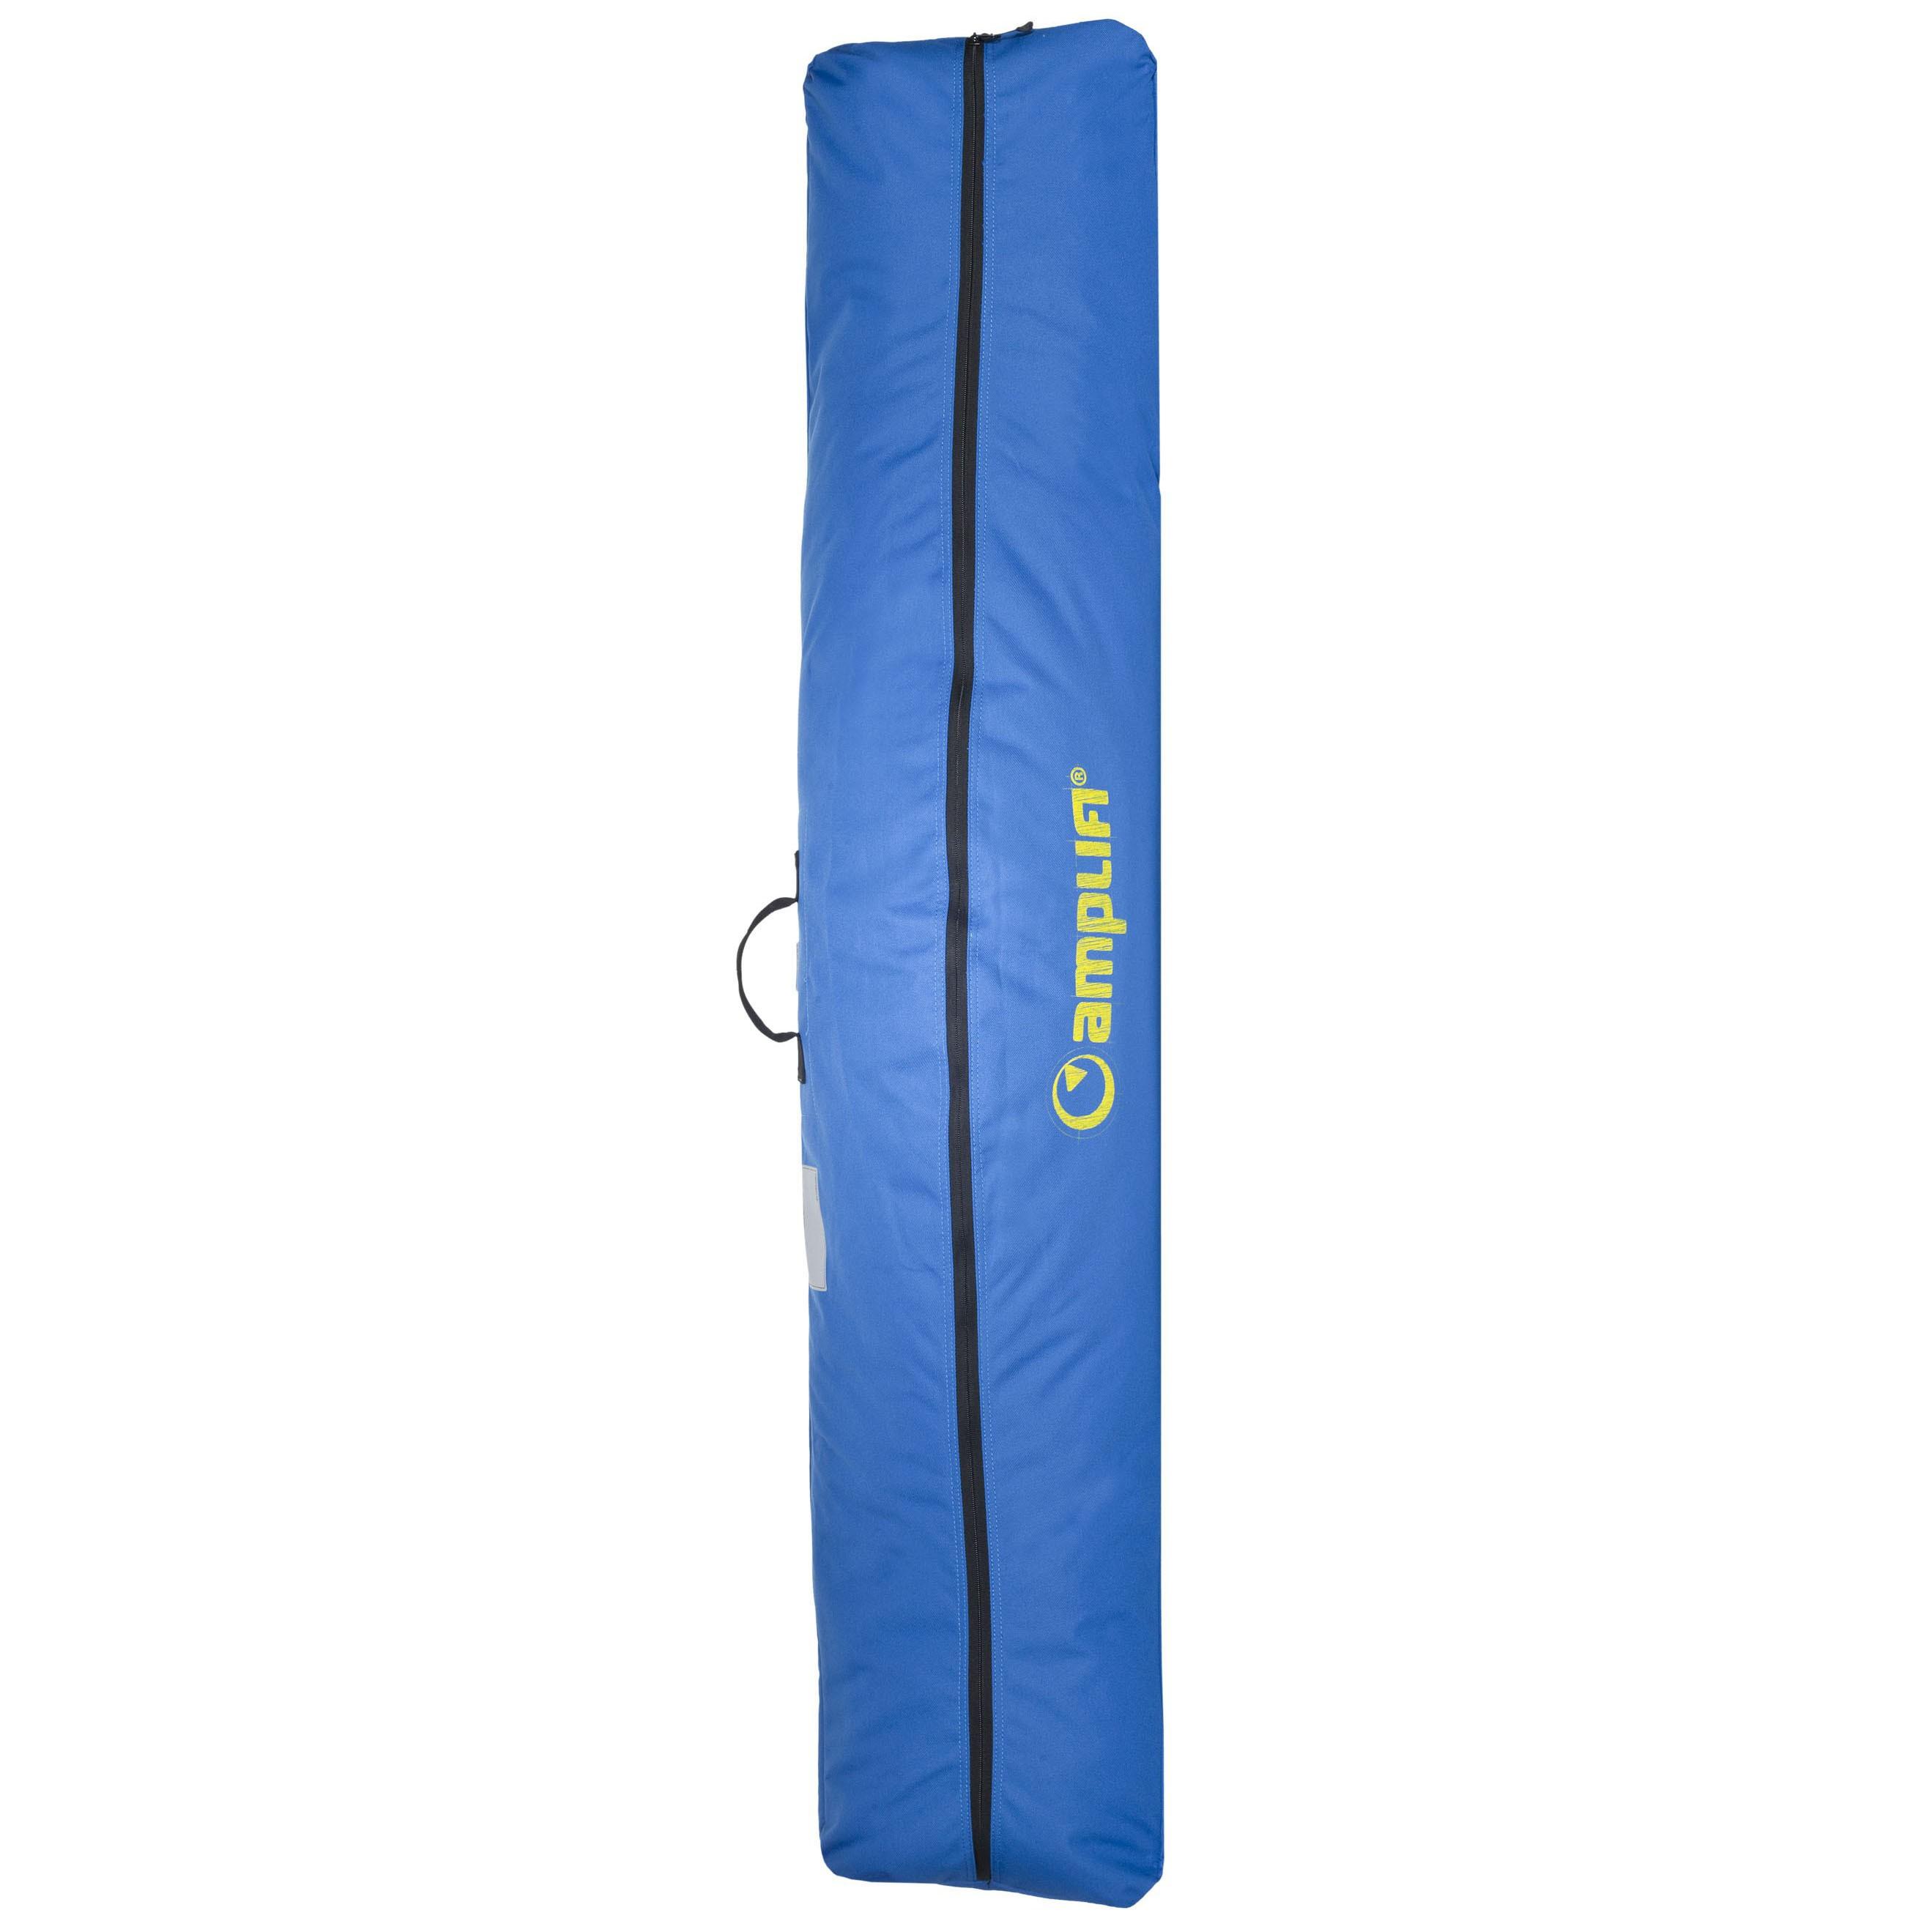 Obal na snowboard Amplifi Stash Sack blue